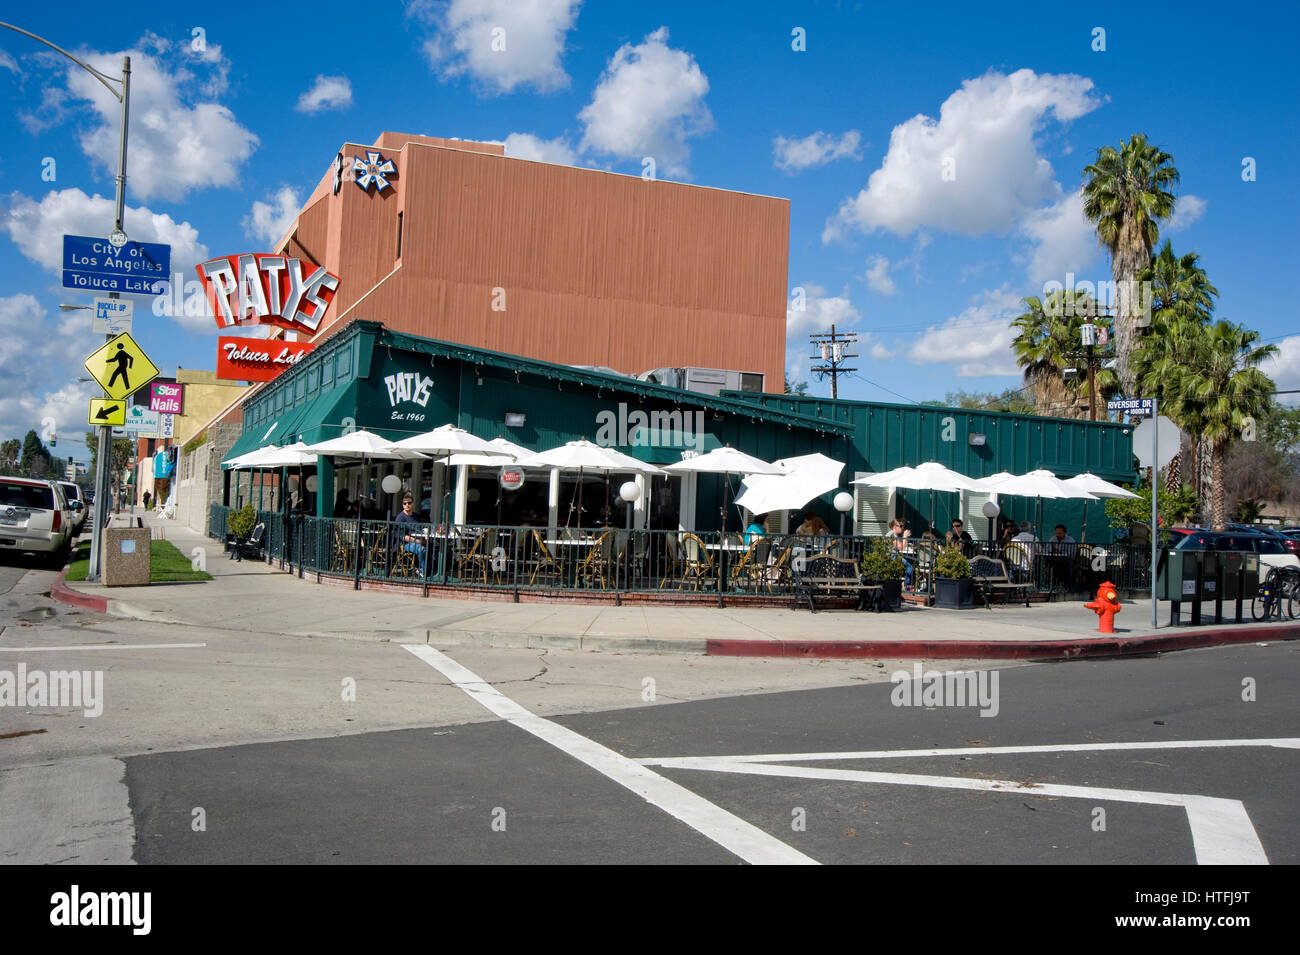 Patys classic diner et coffee shop à Toluca Lake, Californie Photo Stock